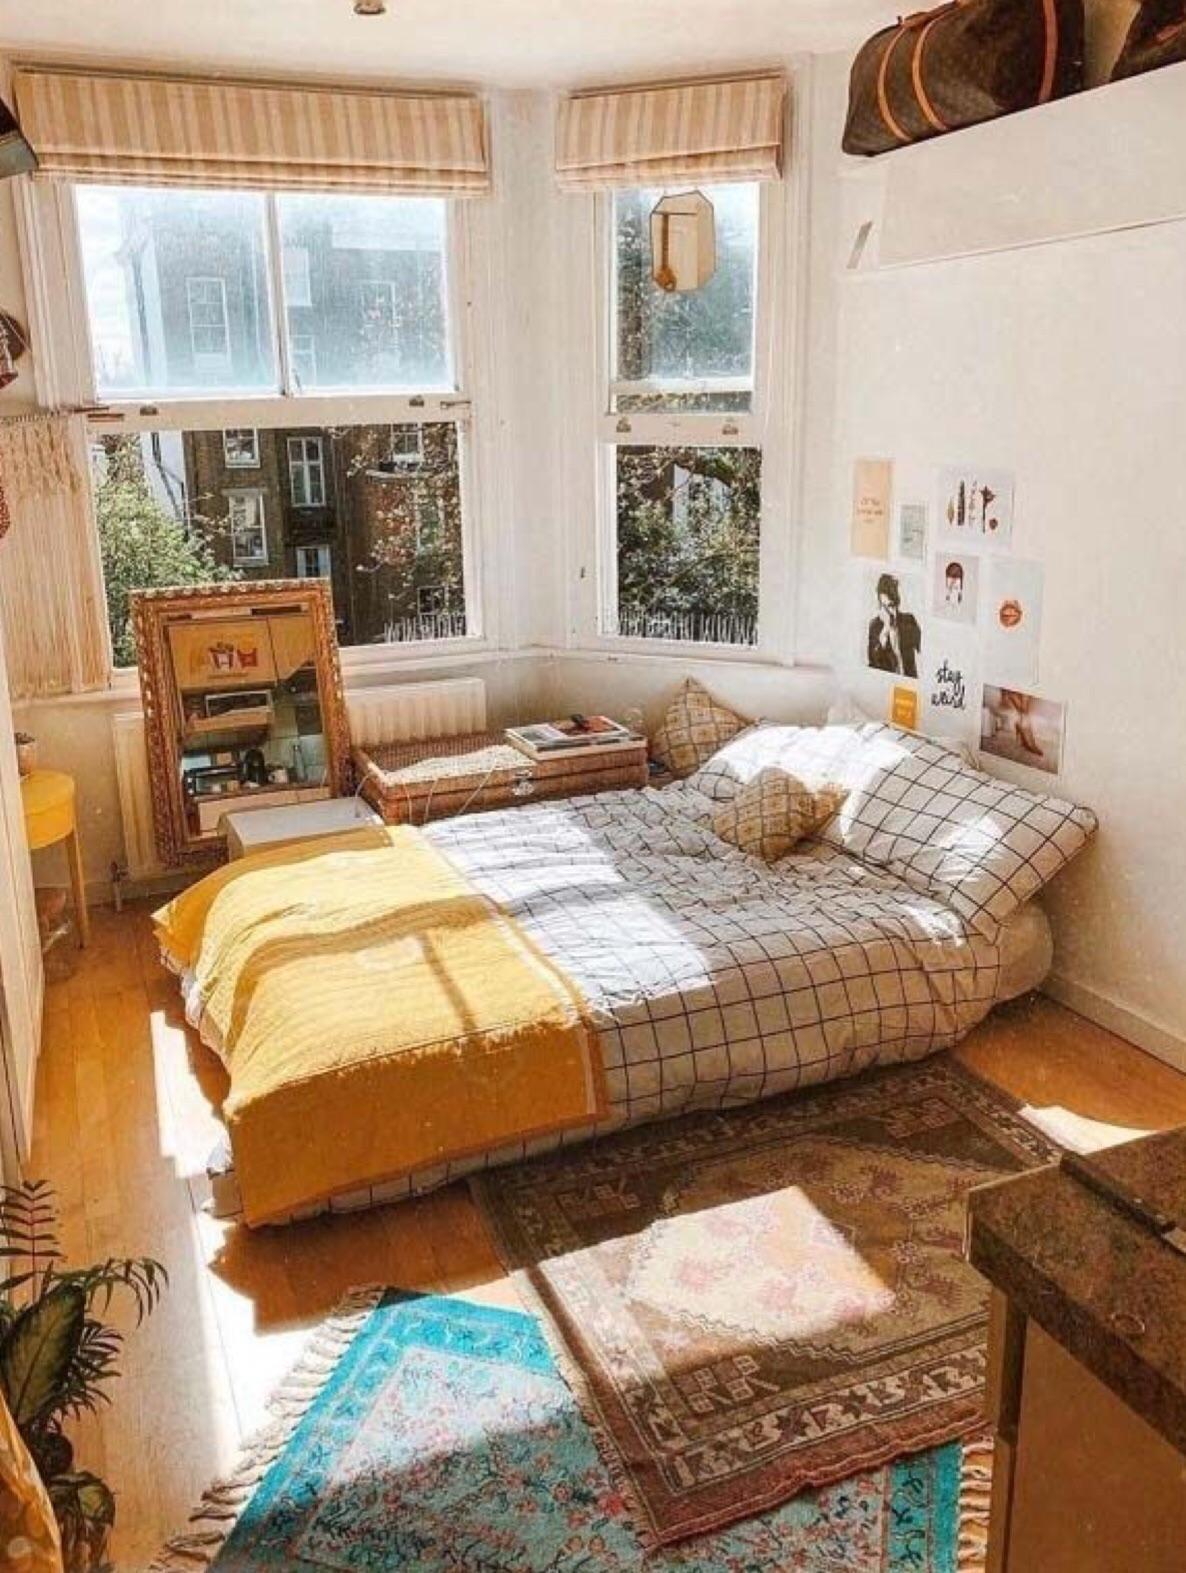 Home Interior Design Bright Bedroom Aesthetic Bedroom Aesthetic Rooms Home Bedroom